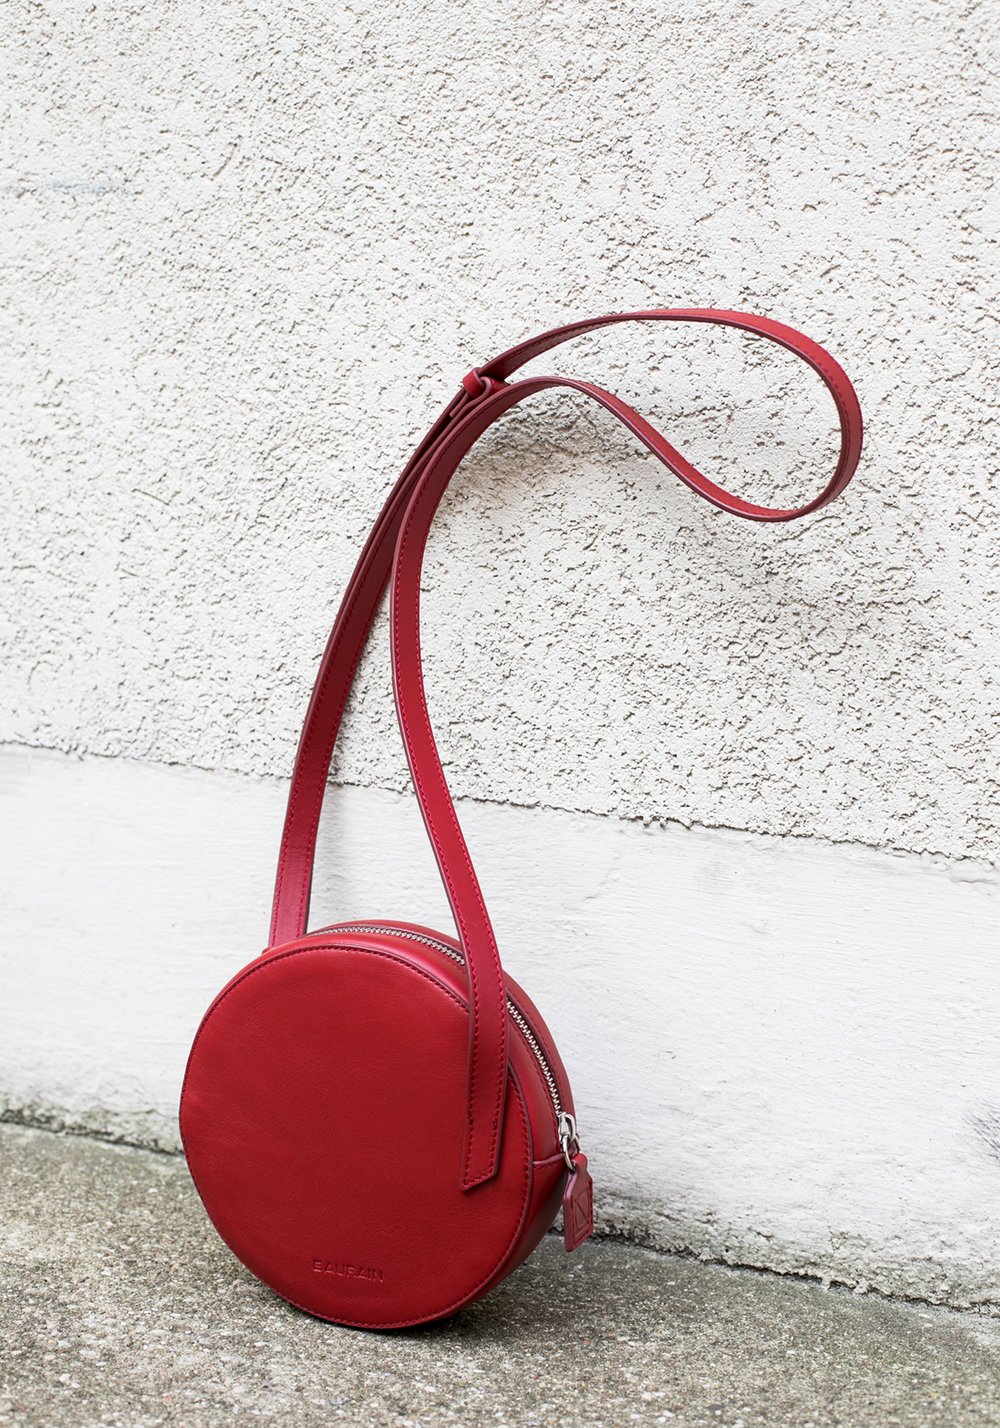 BAURAIN FW18 sputnik crossbody bag